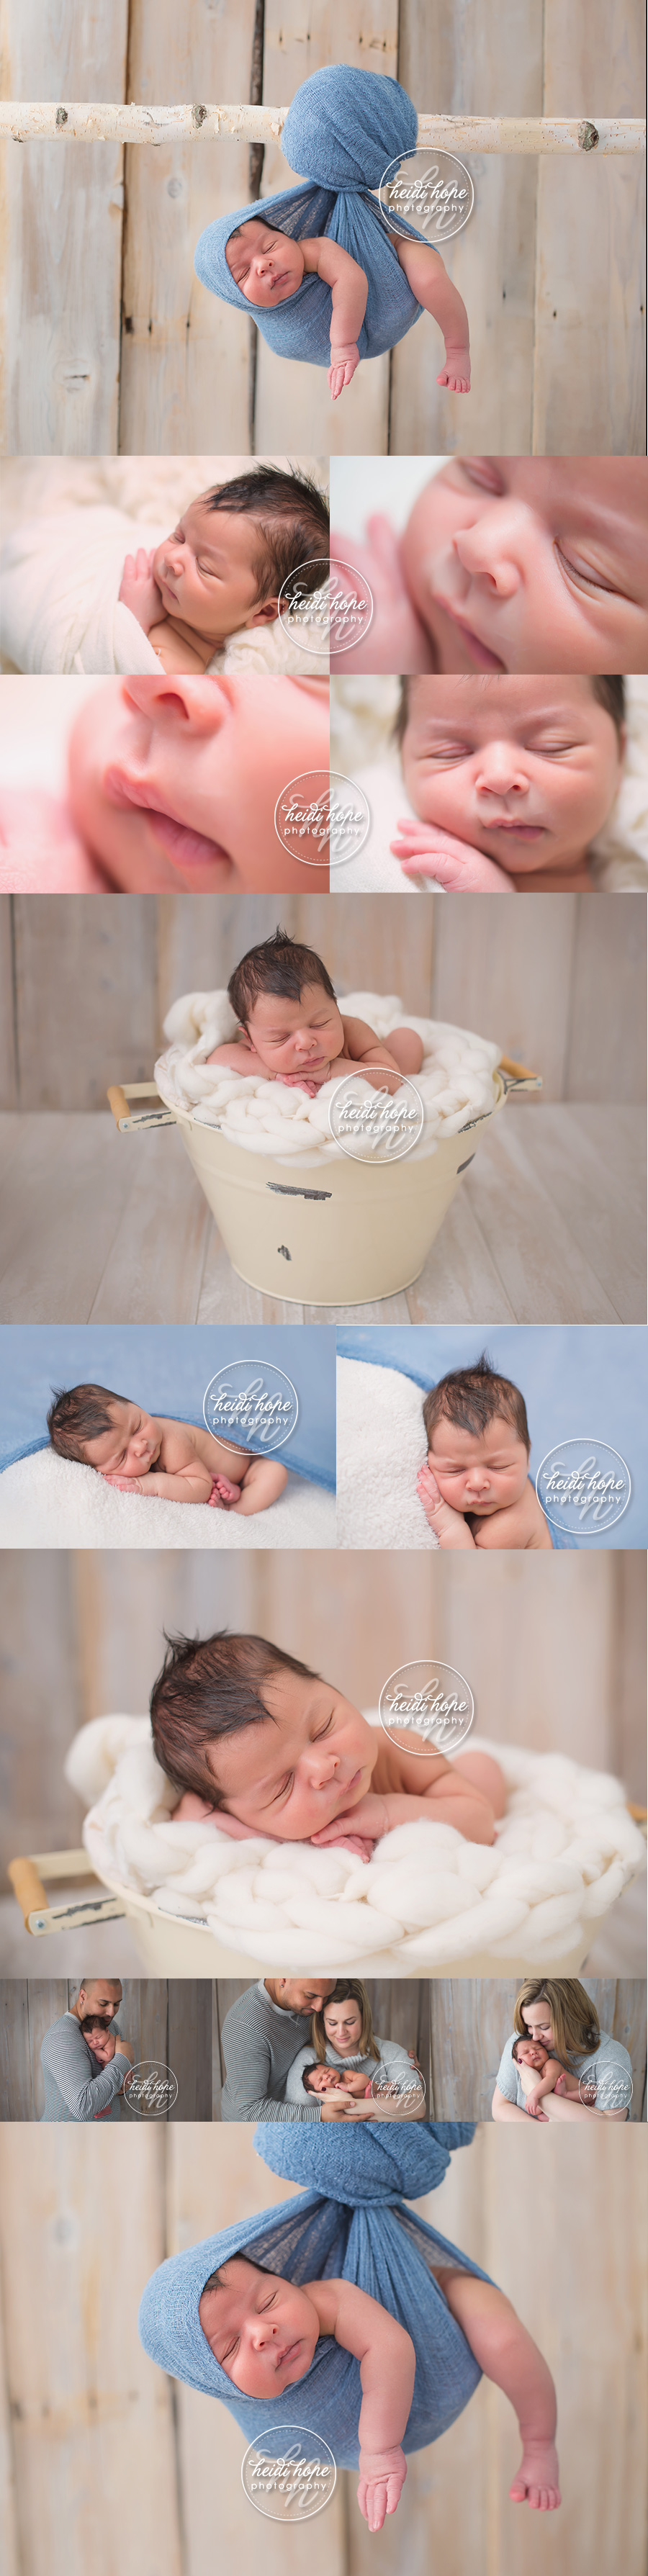 boston | newborn photographer | classic | baby boy | blue | heidi hope photography studio